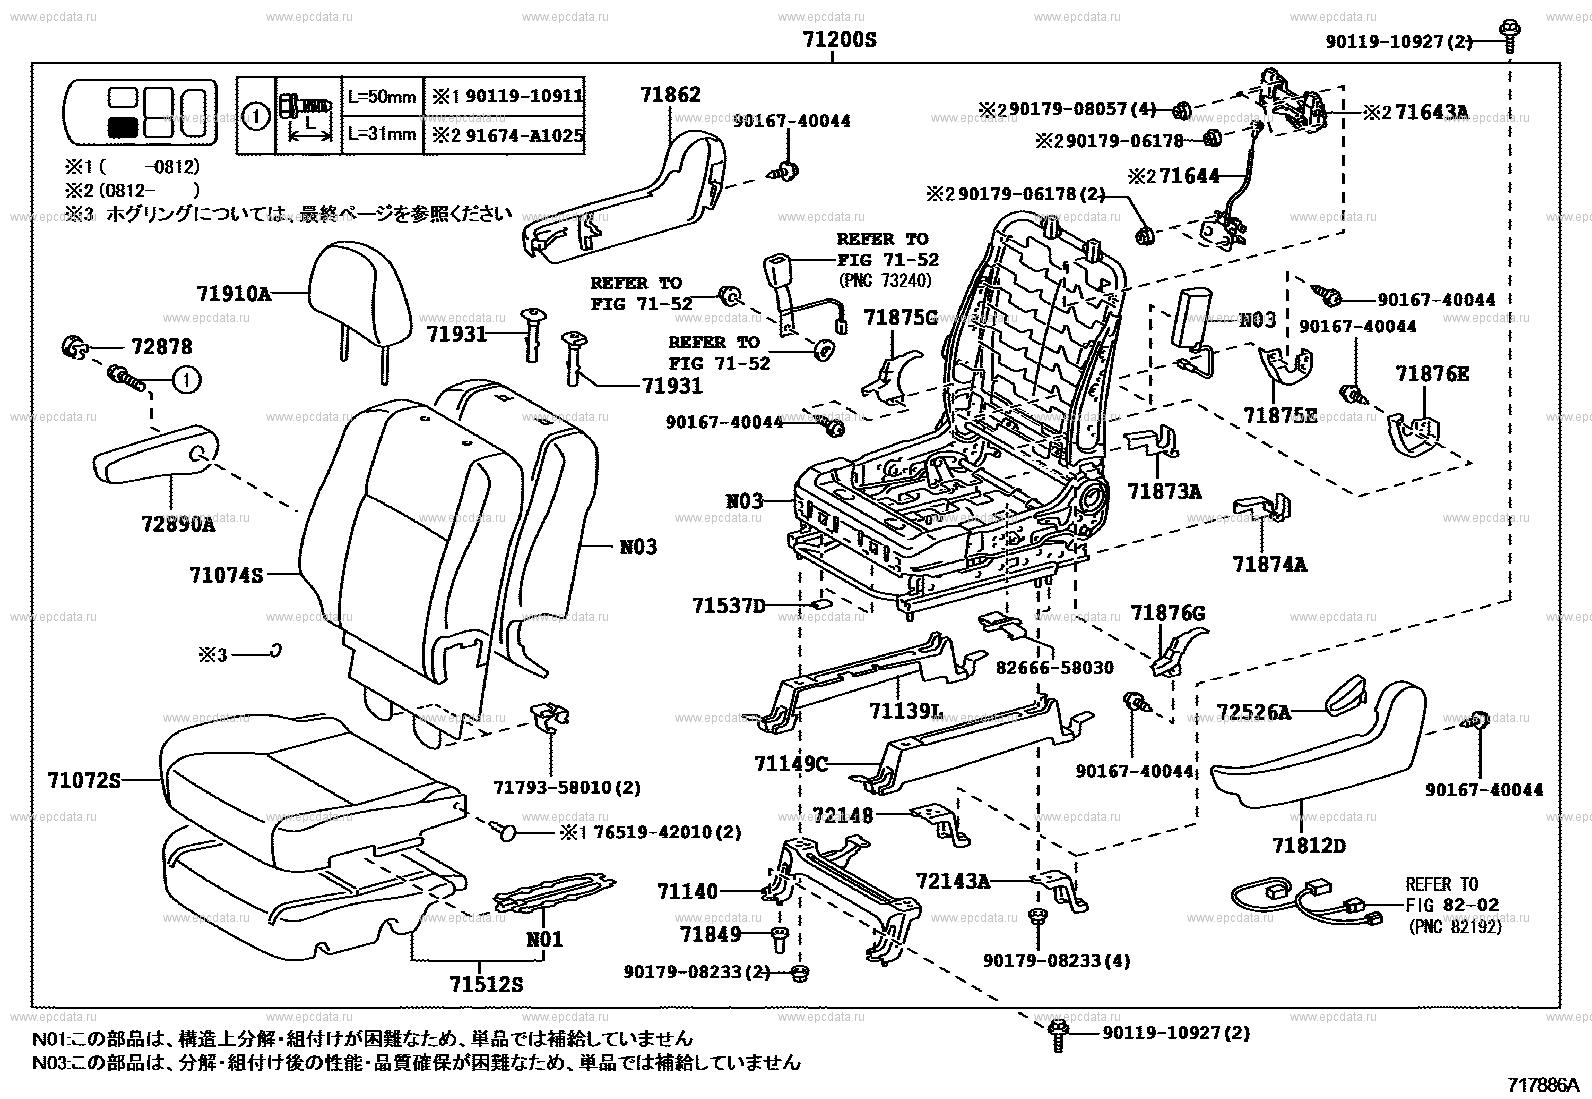 TOYOTA Genuine 71874-06010-A0 Seat Cushion Shield